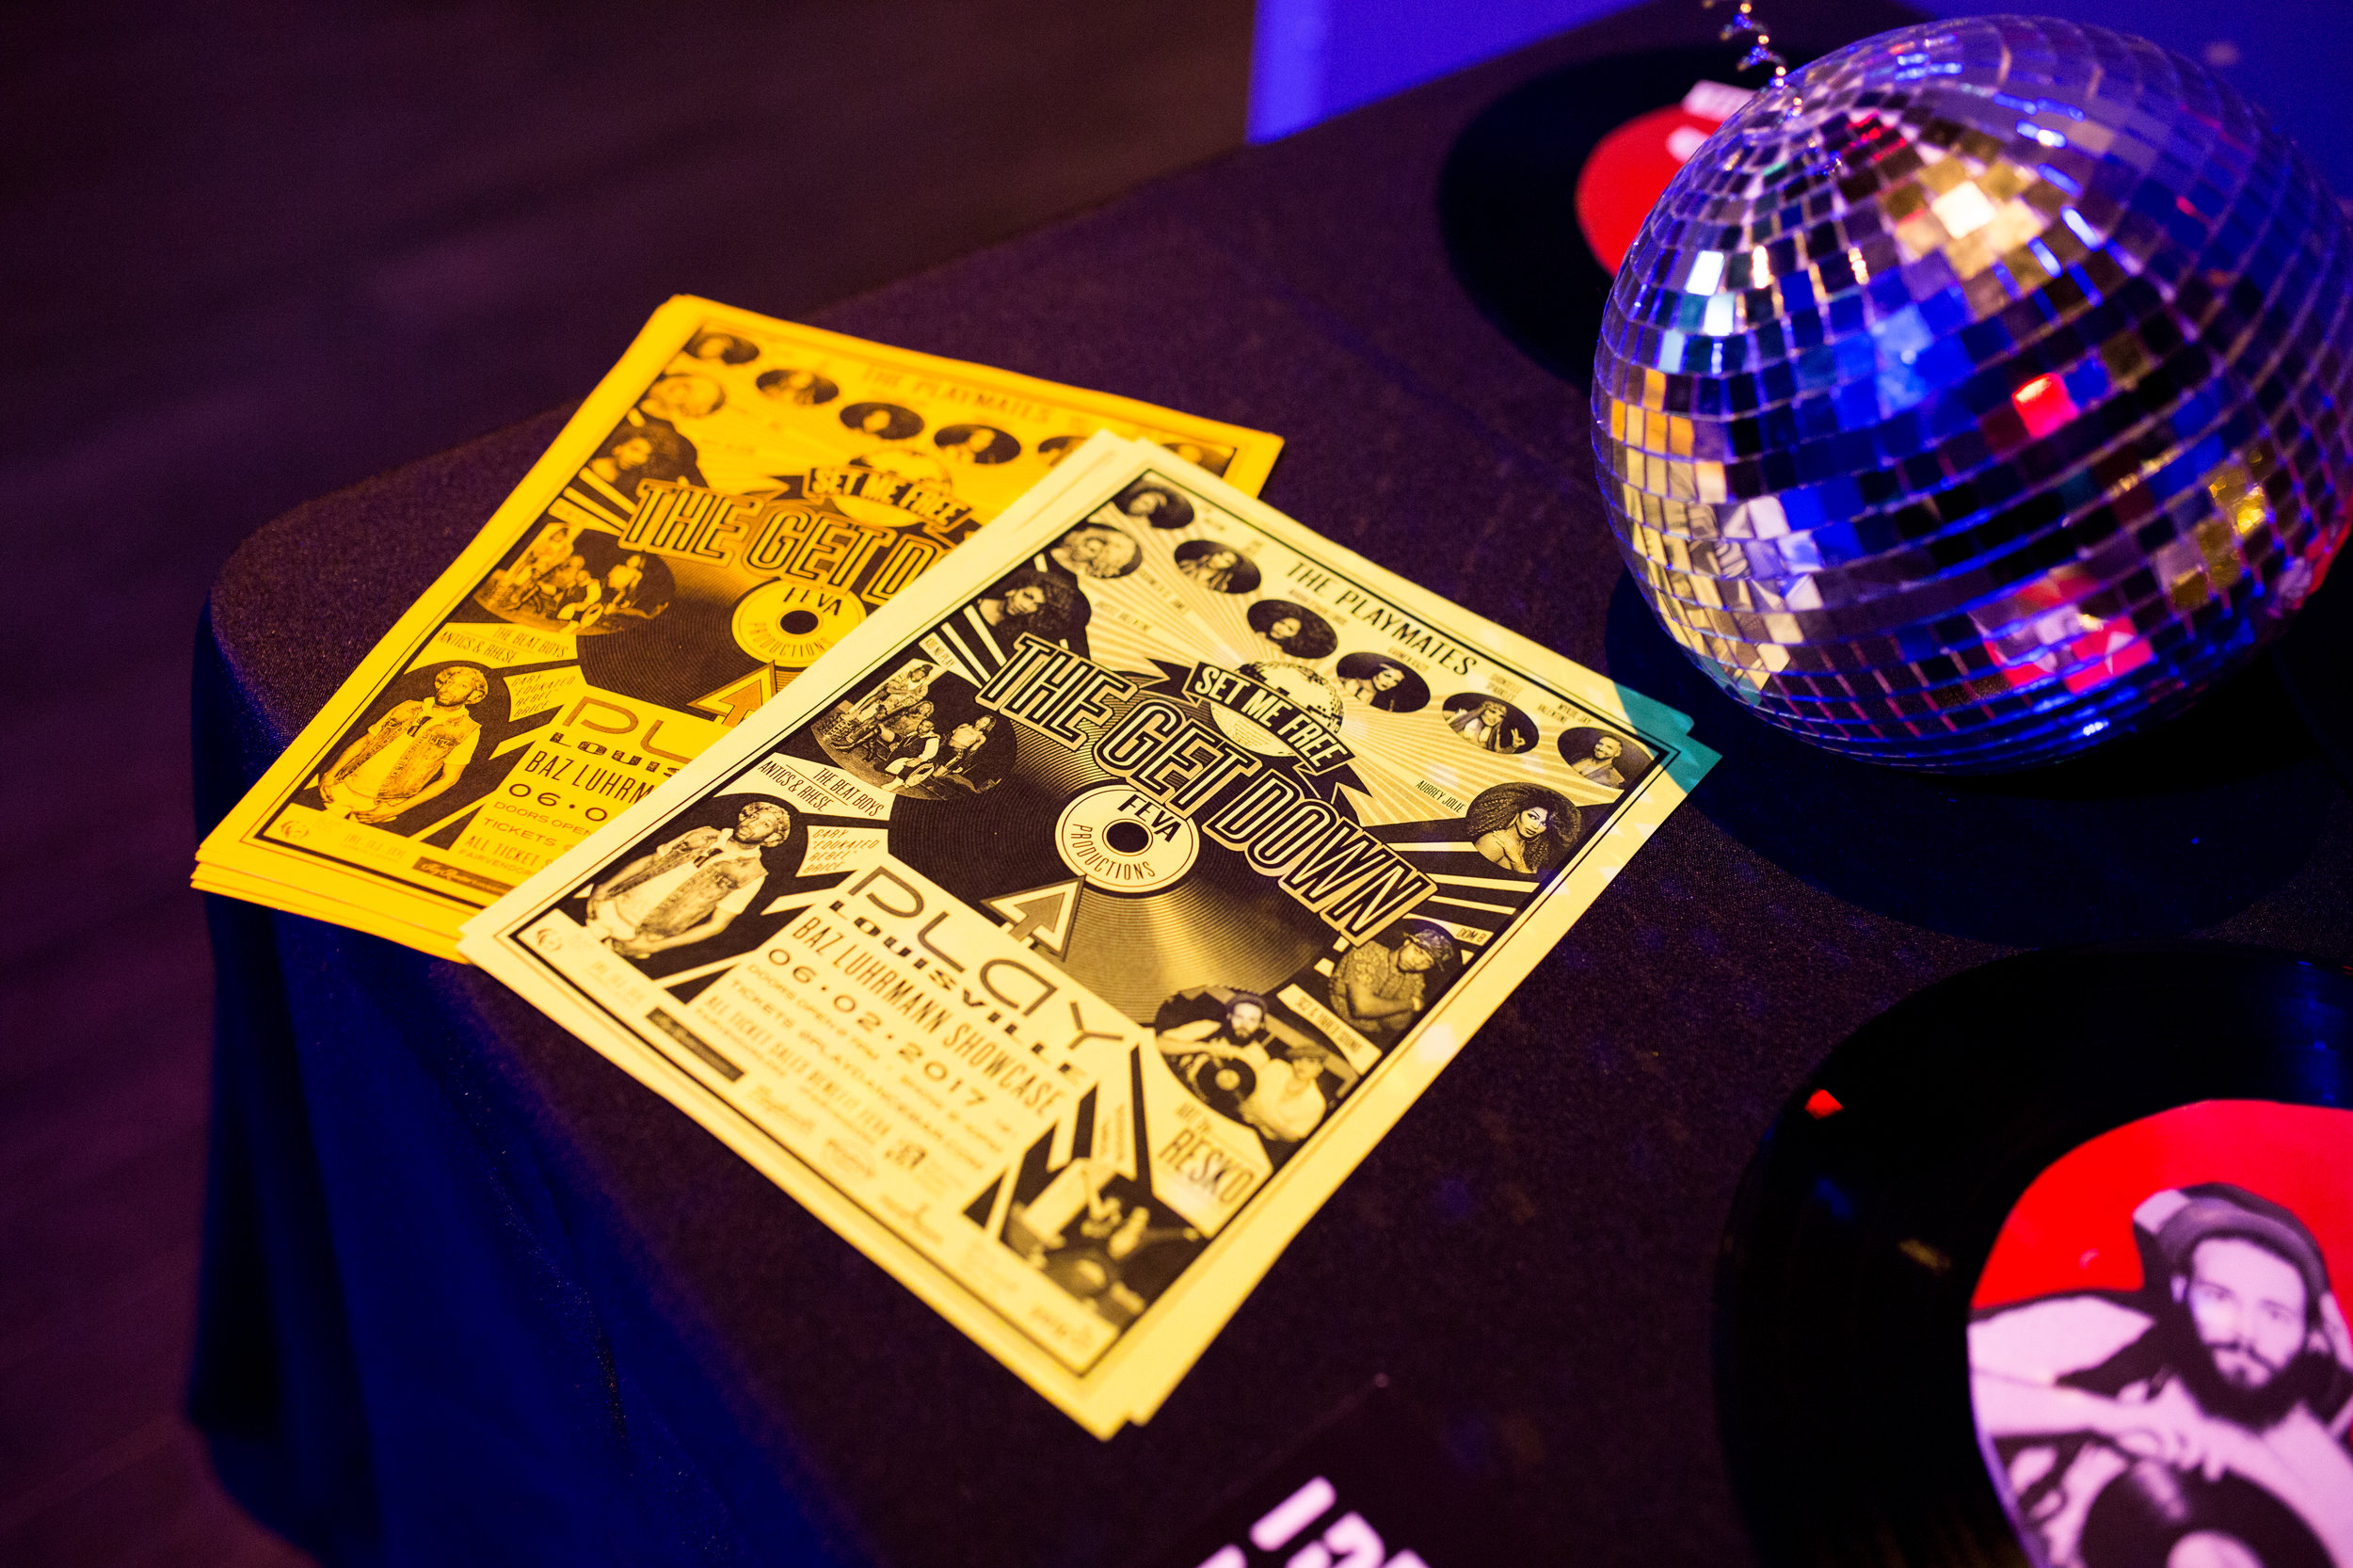 Modern Louisville Magazine Modern Vows Launch Party at Mercury Ballroom 5-17-17 Crystal Ludwick Photo 15.jpg